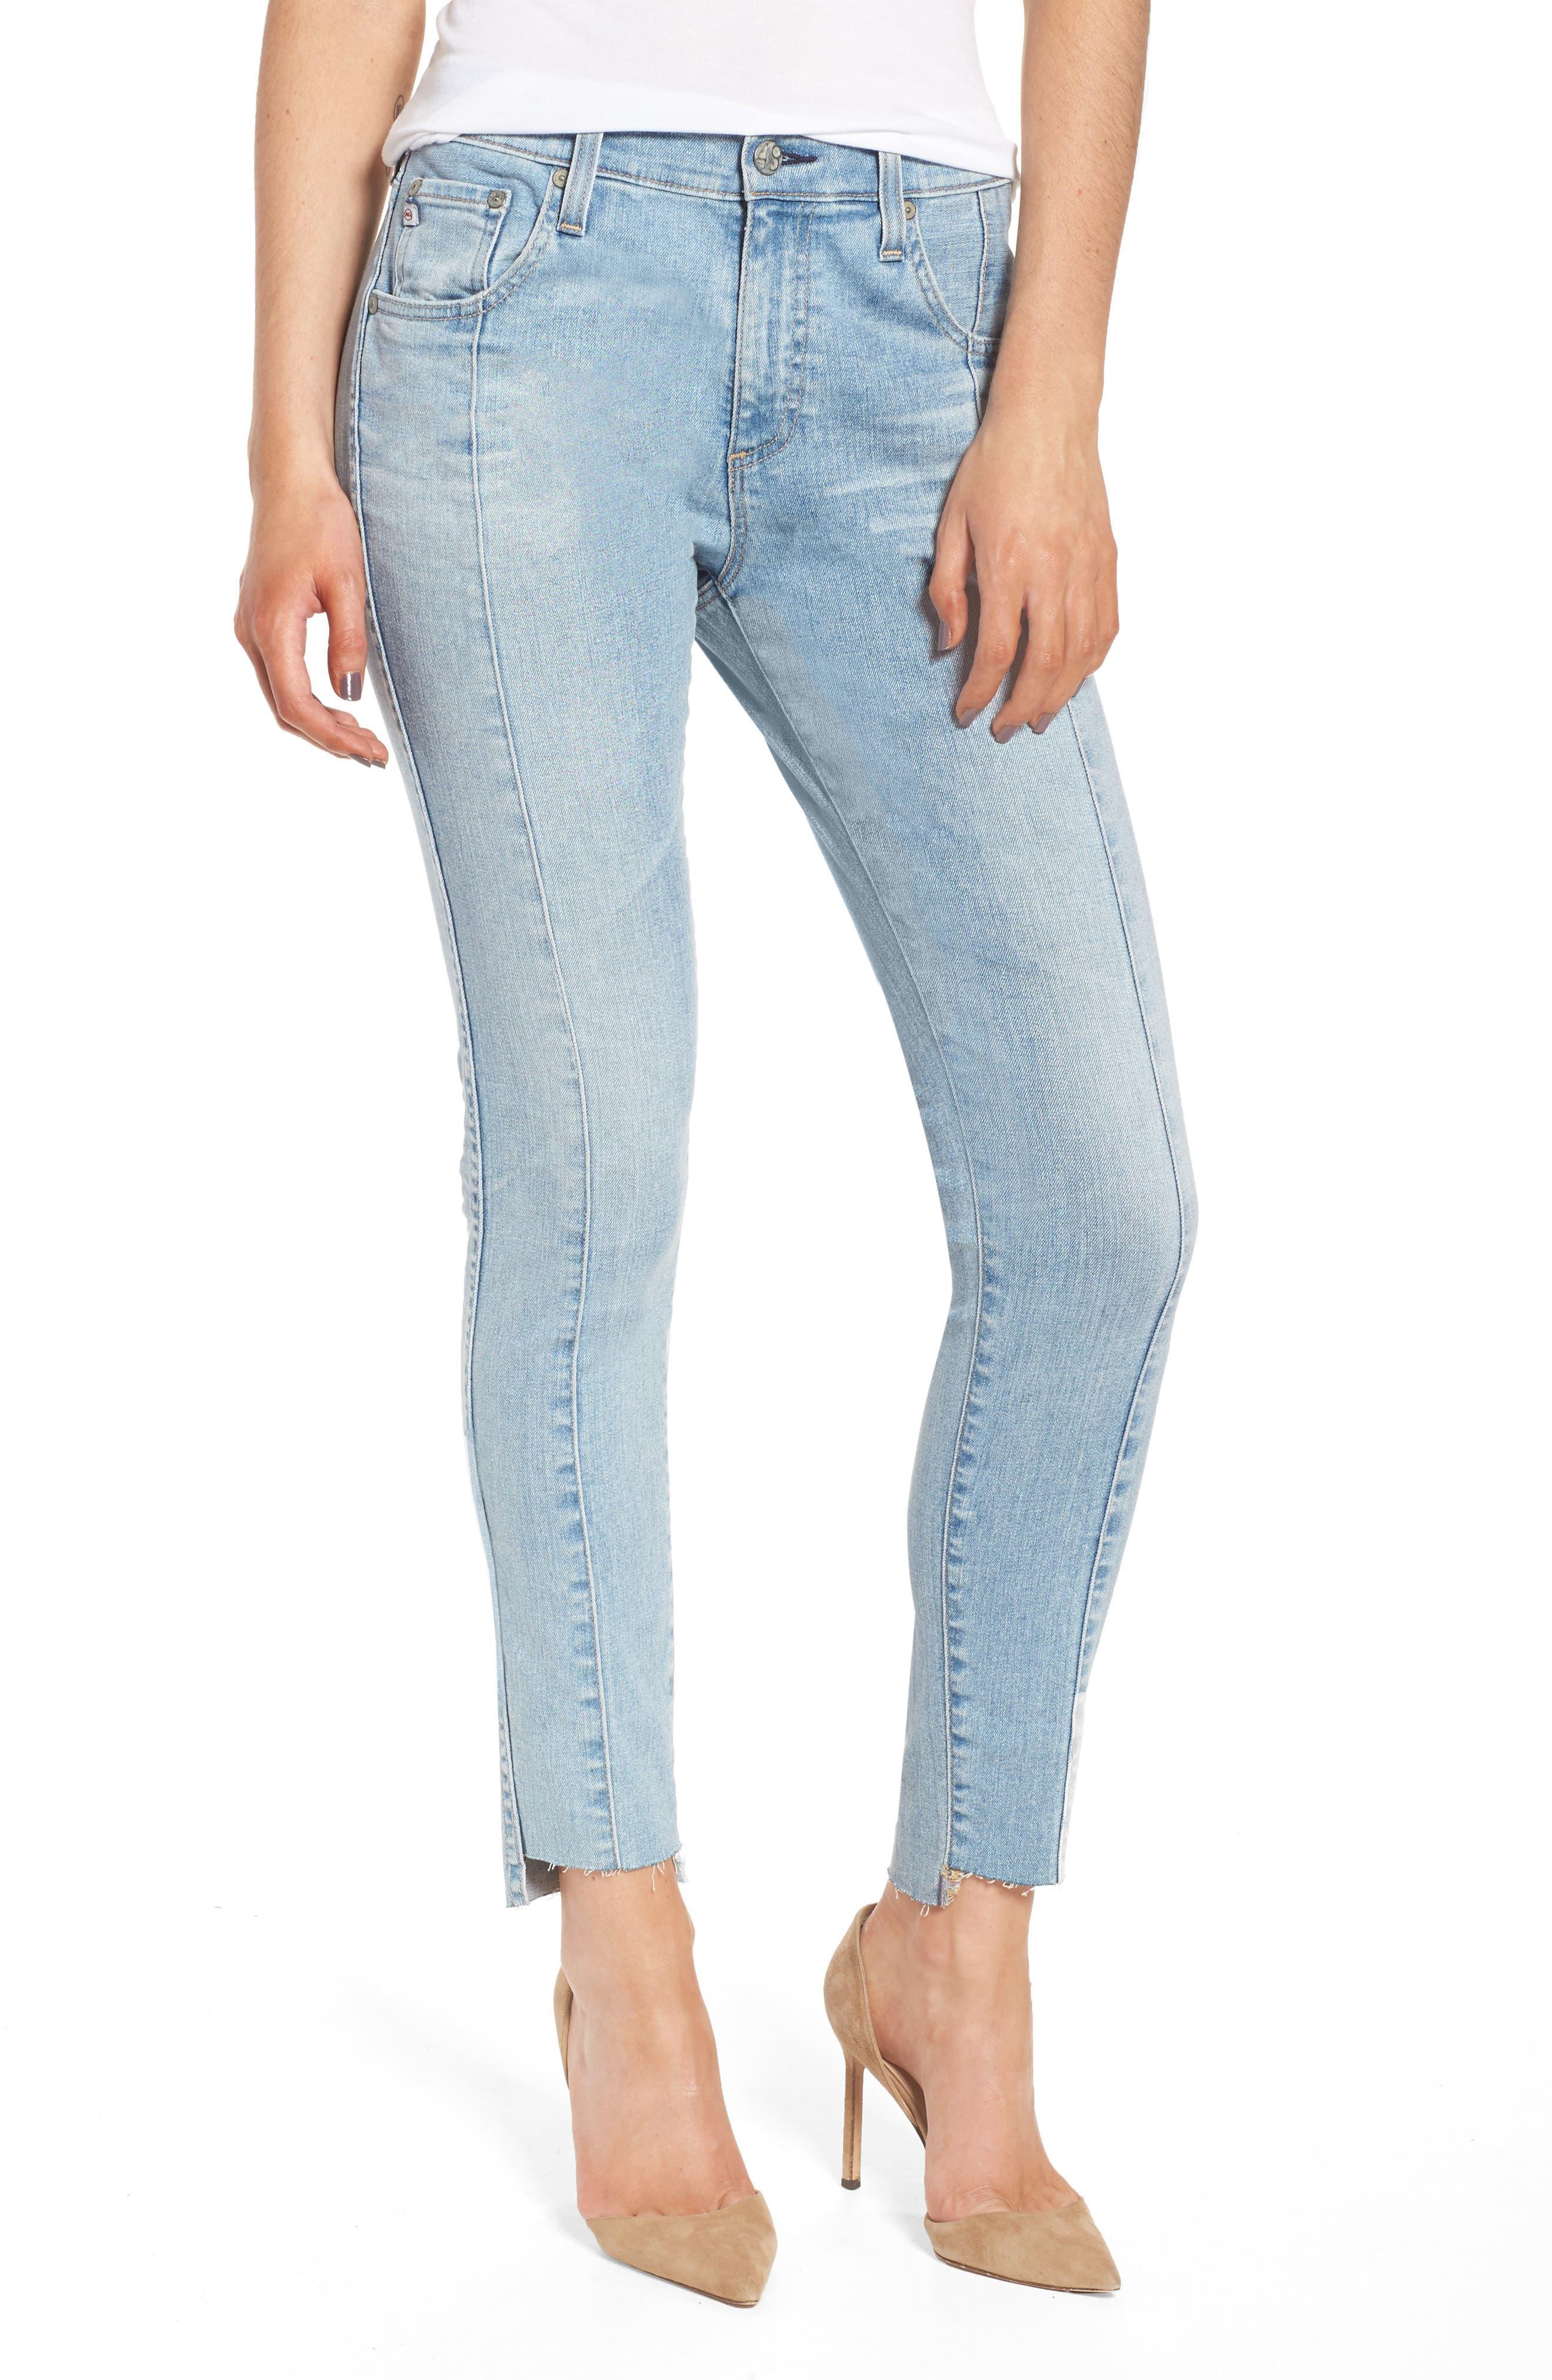 Alternate Image 1 Selected - AG The Farrah High Waist Ankle Skinny Jeans (20 Years Oceana)